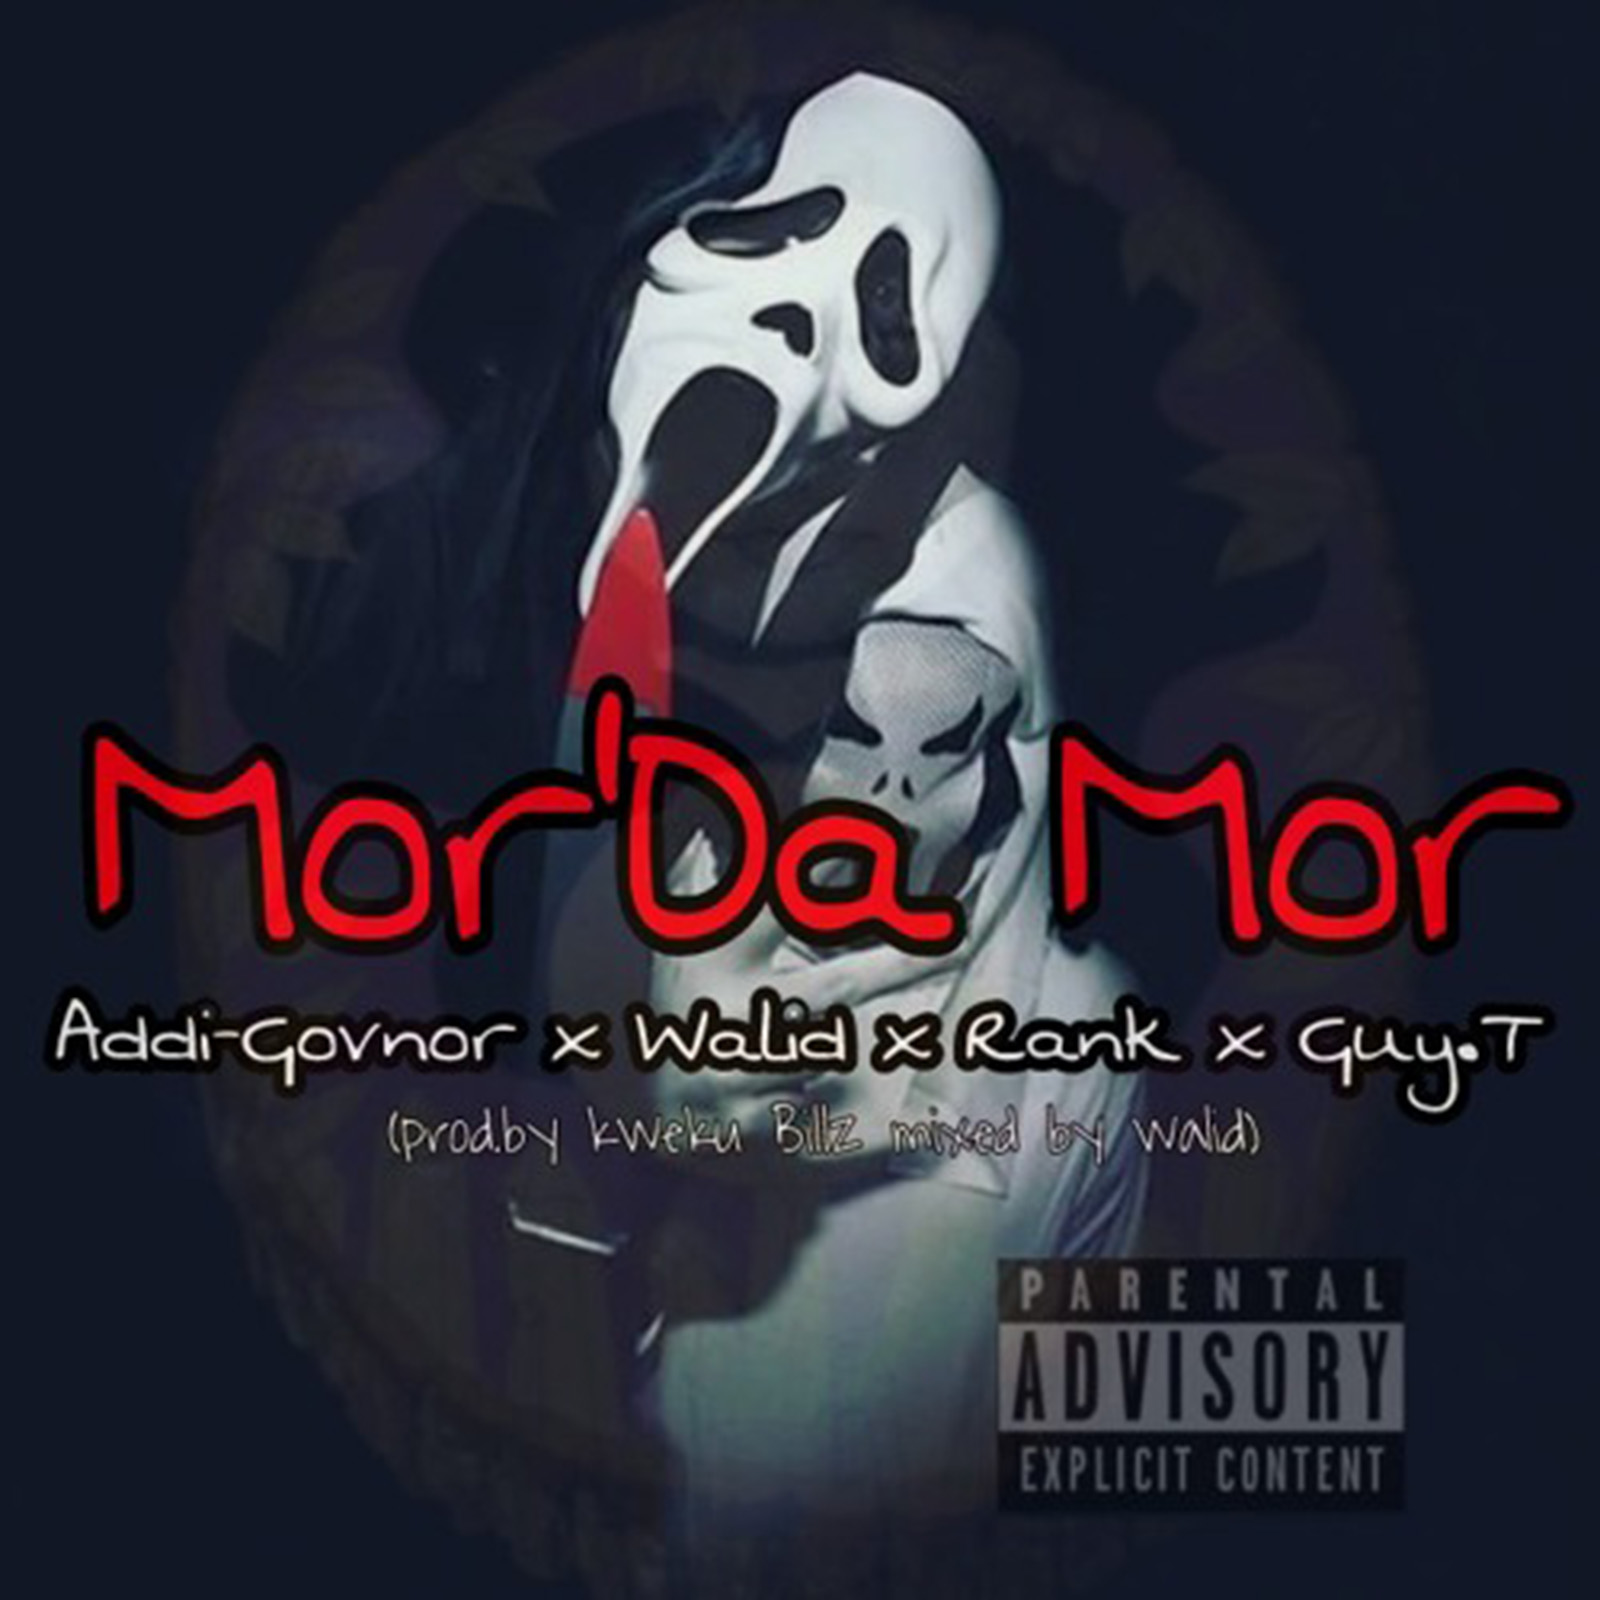 Mor'Da Mor by Addi Govnor feat. Walid, Rank & Guy T